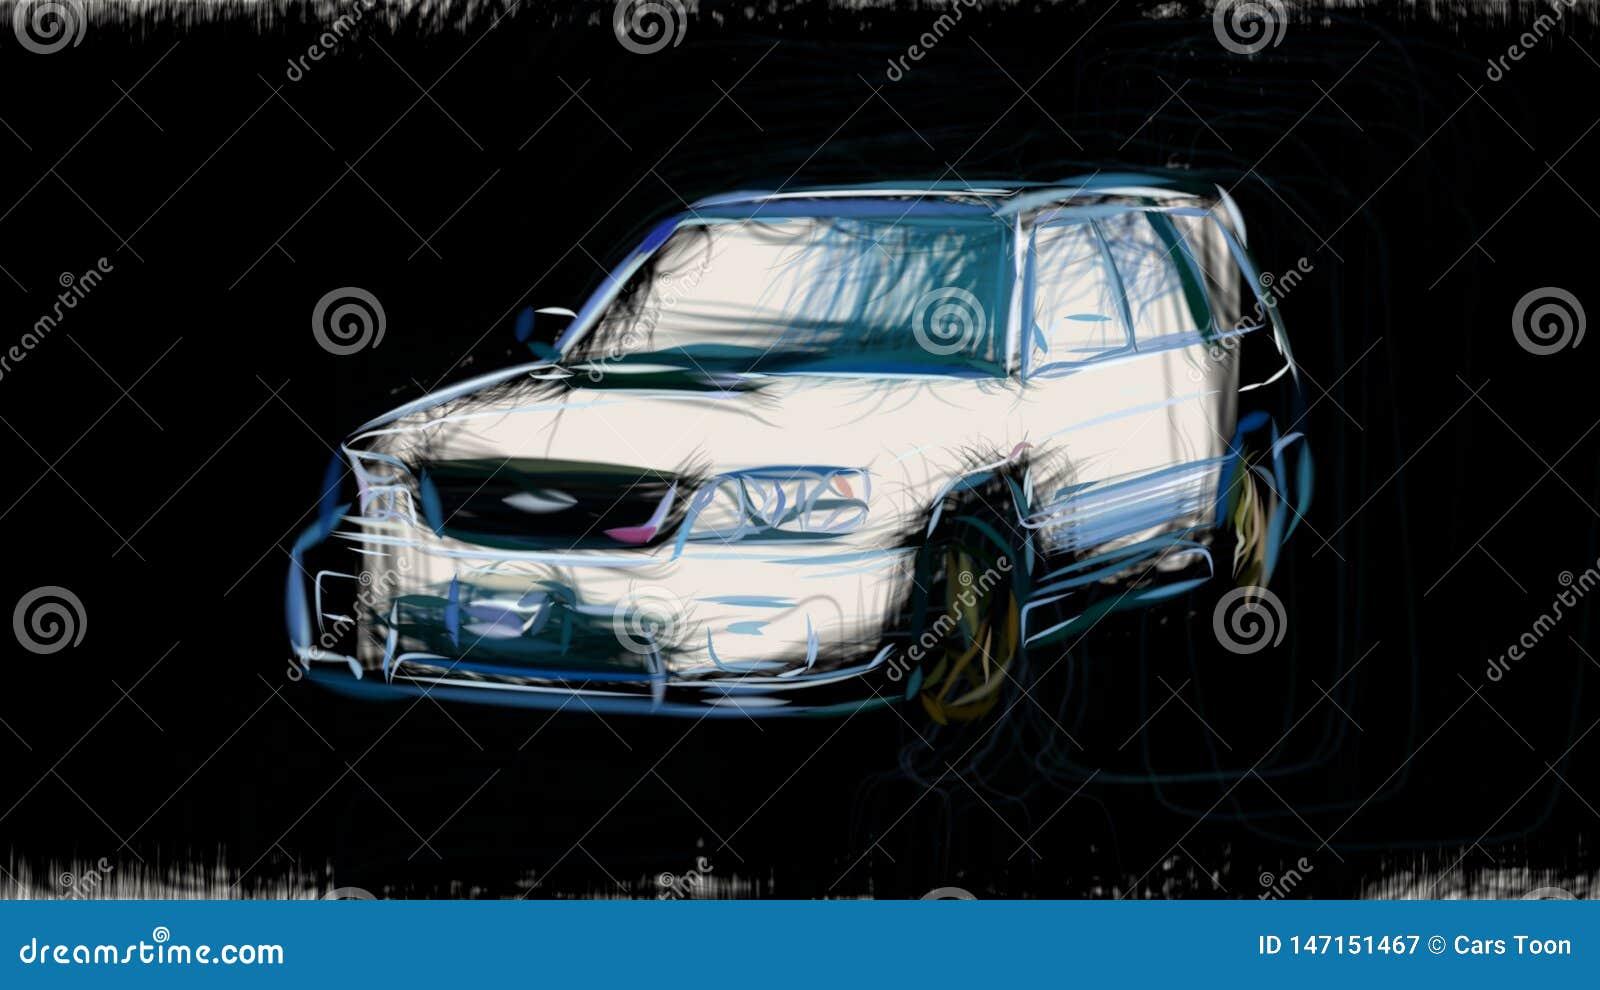 2000 Subaru Forester Sti Ii Id 2812 Stock Illustration